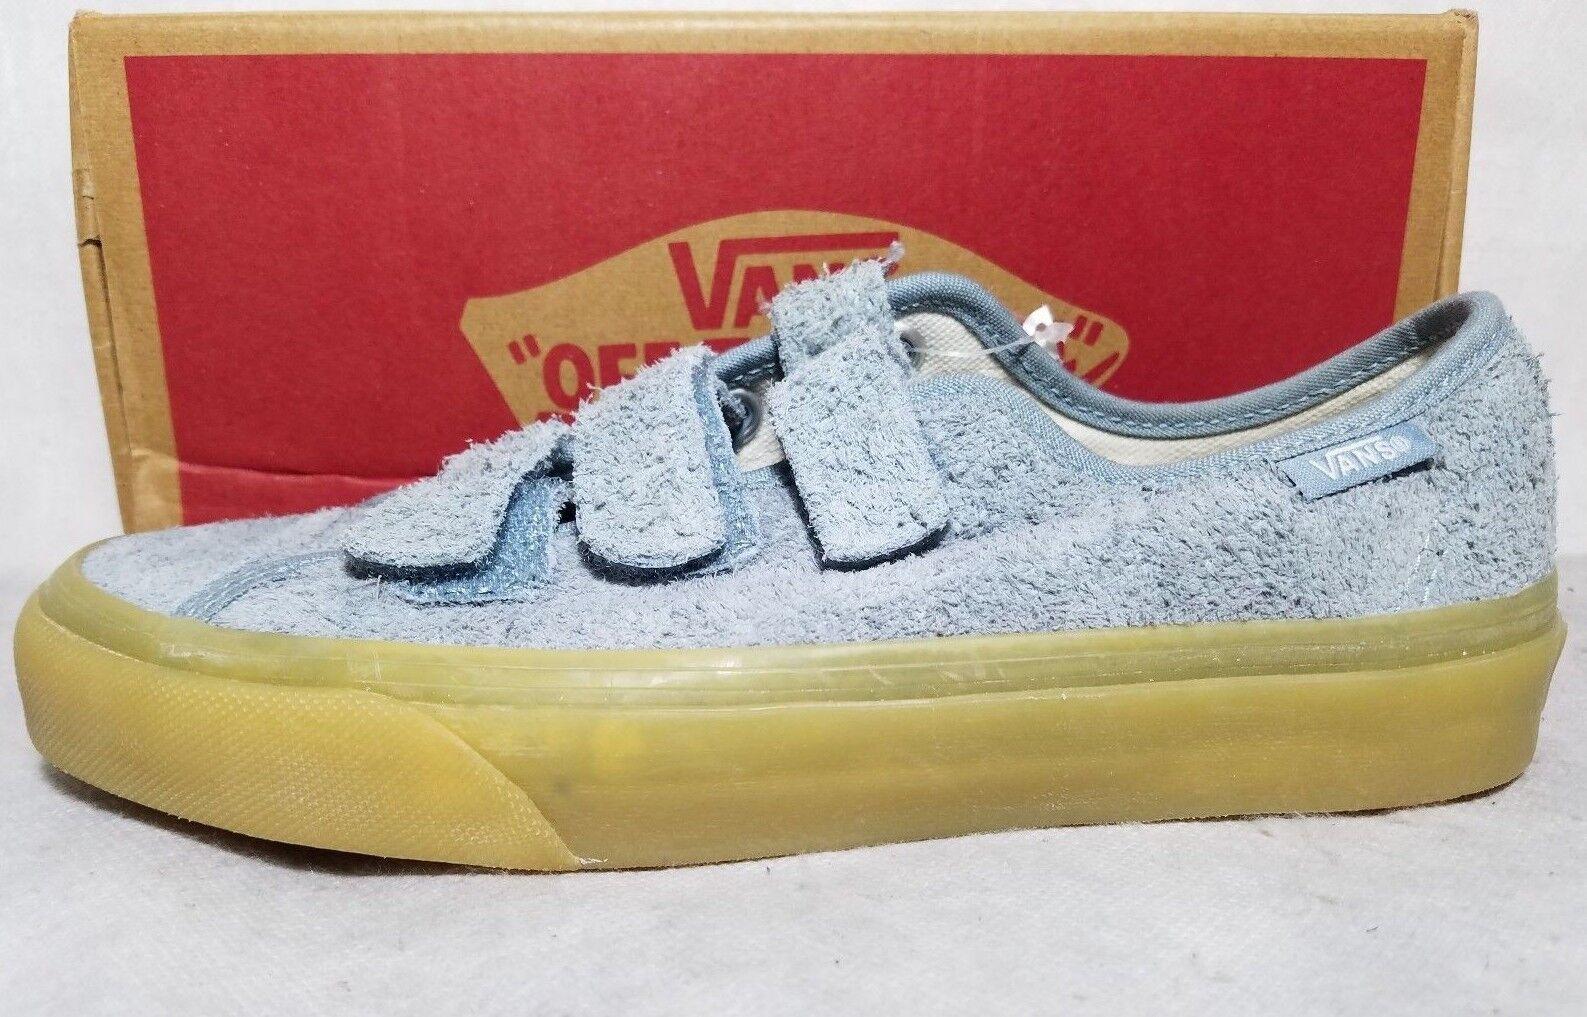 New Vans Fuzzy Blue Suede Gum Arona Prison Issue Strap Skate Shoe Women Size 6.5